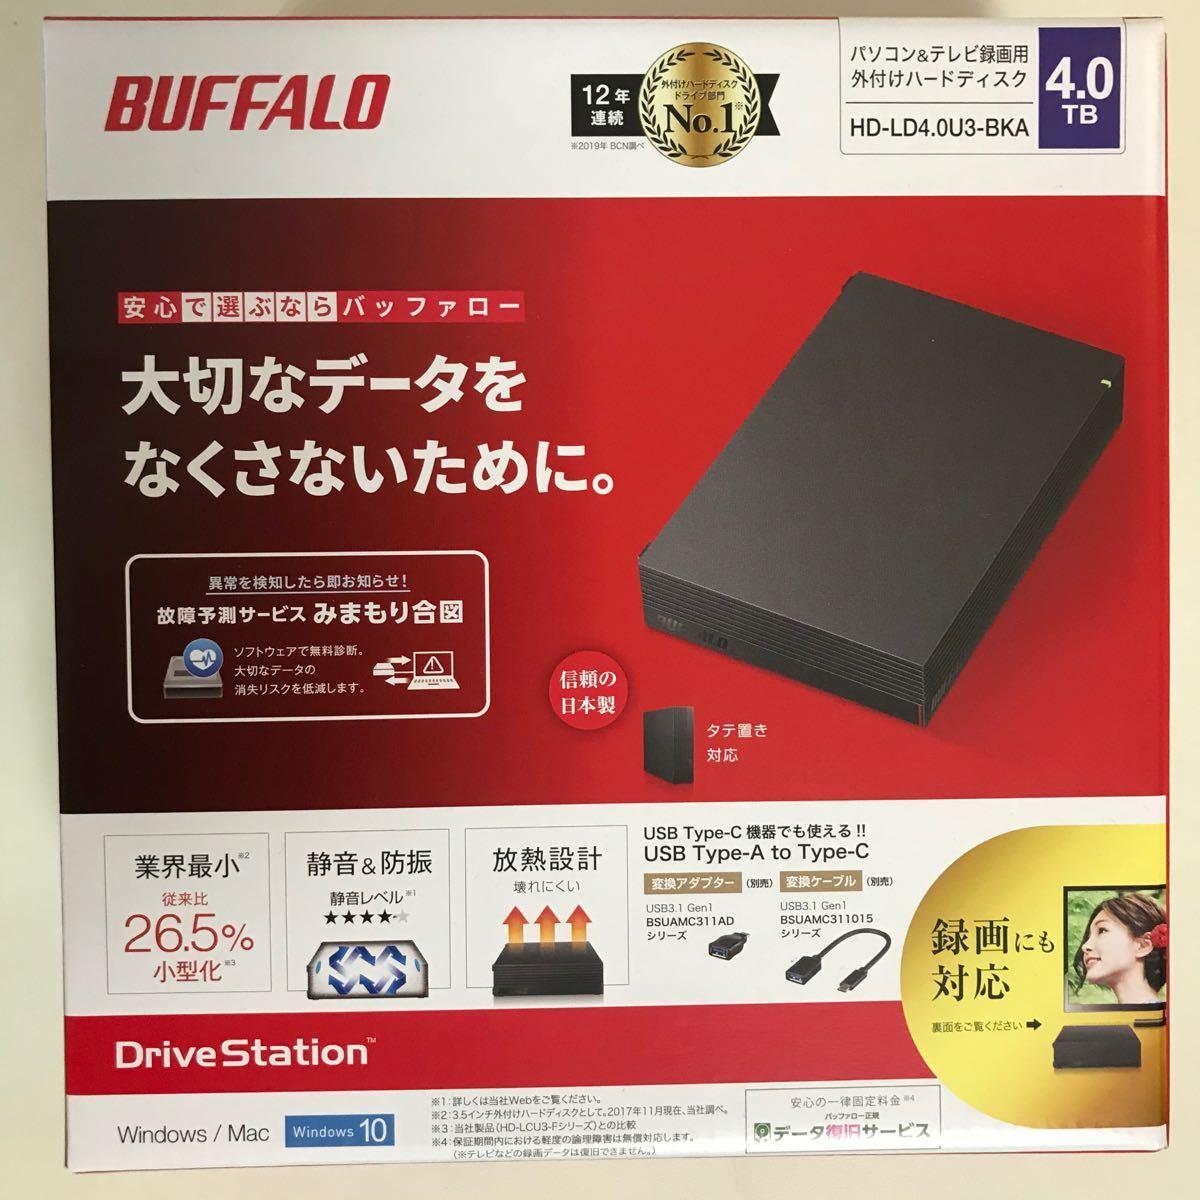 HD-LD4.0U3-BKA バッファロー USB3.1(Gen1)/3.0対応 外付けHDD 4TB(ブラック)新品未開封